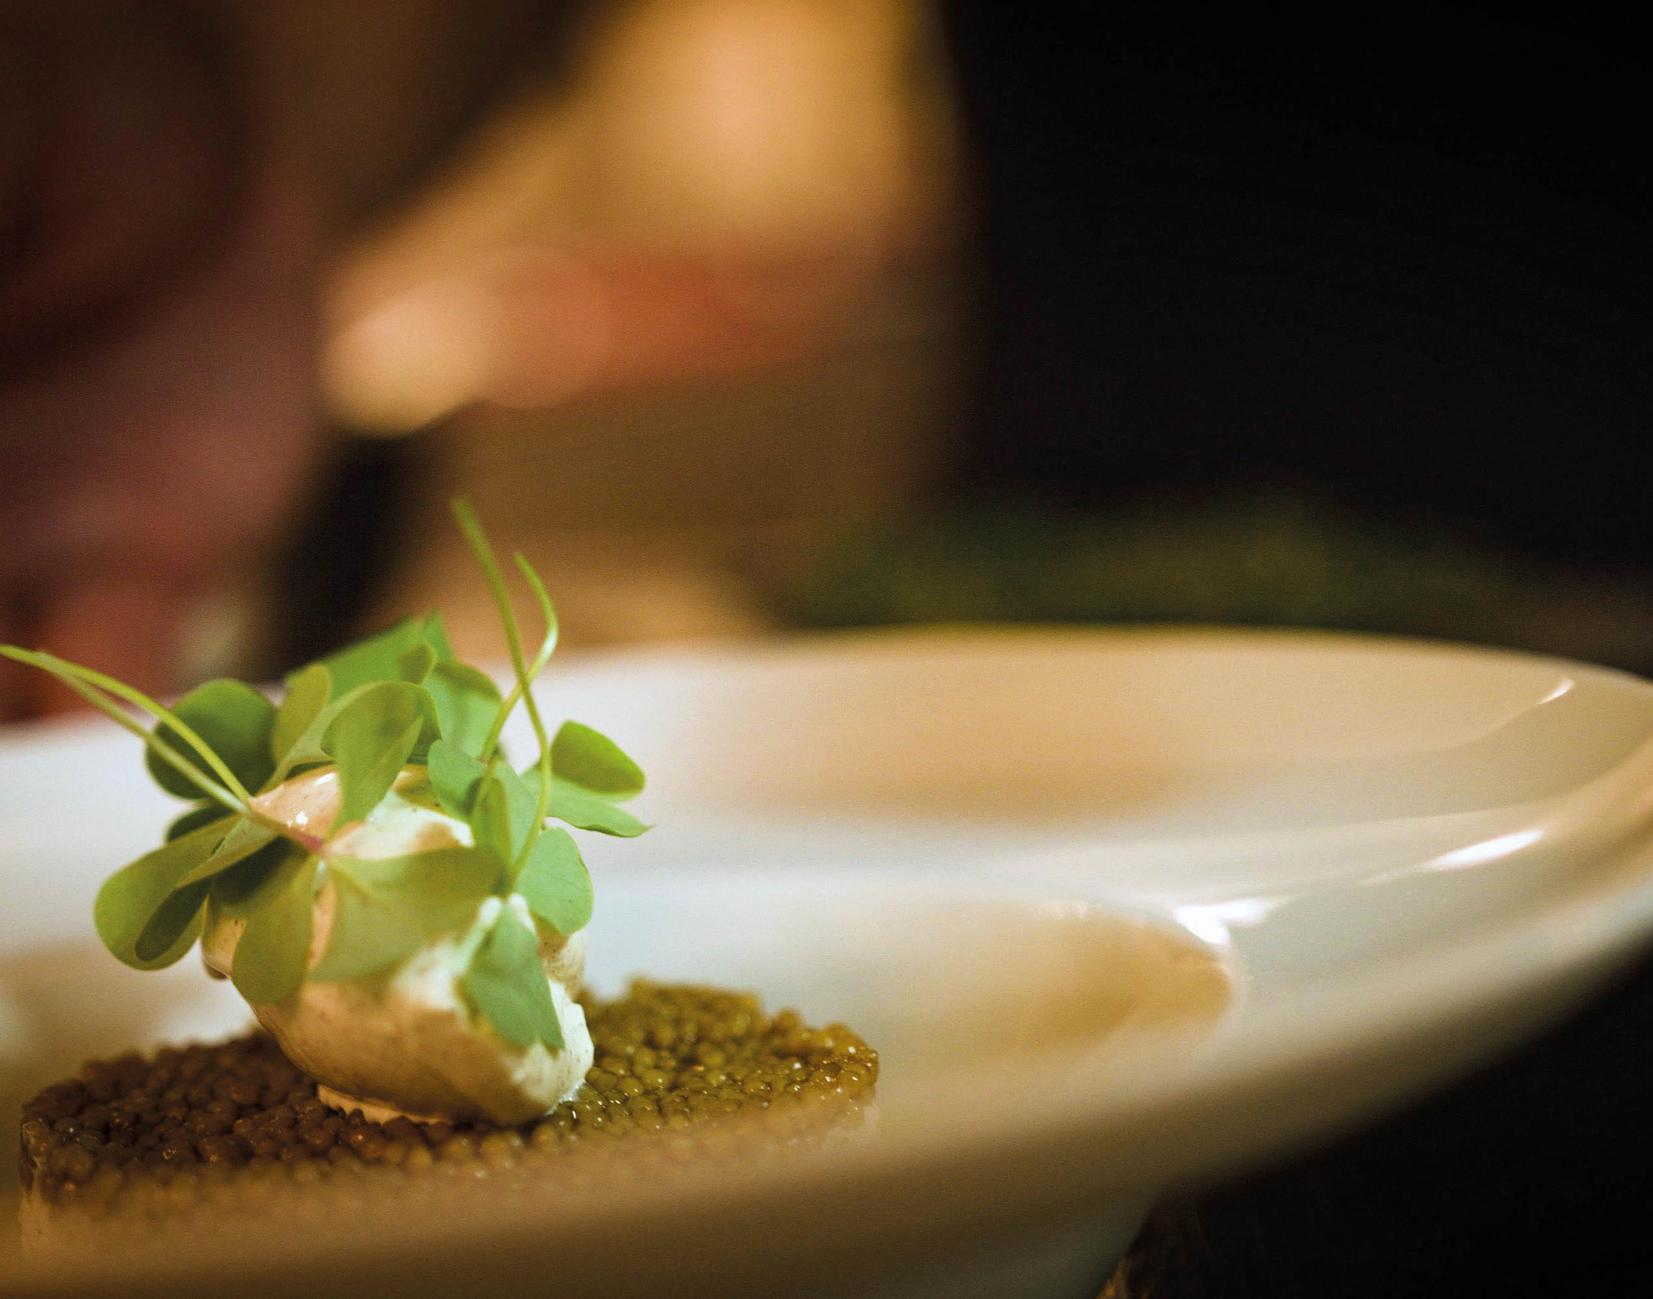 Kulinarischer Kurzurlaub mit Whisky Tast 2 ÜN, 2 Personen Seminaris Avendi Hotel Potsdam - Whisky Tasting, 3-Gänge-Menü